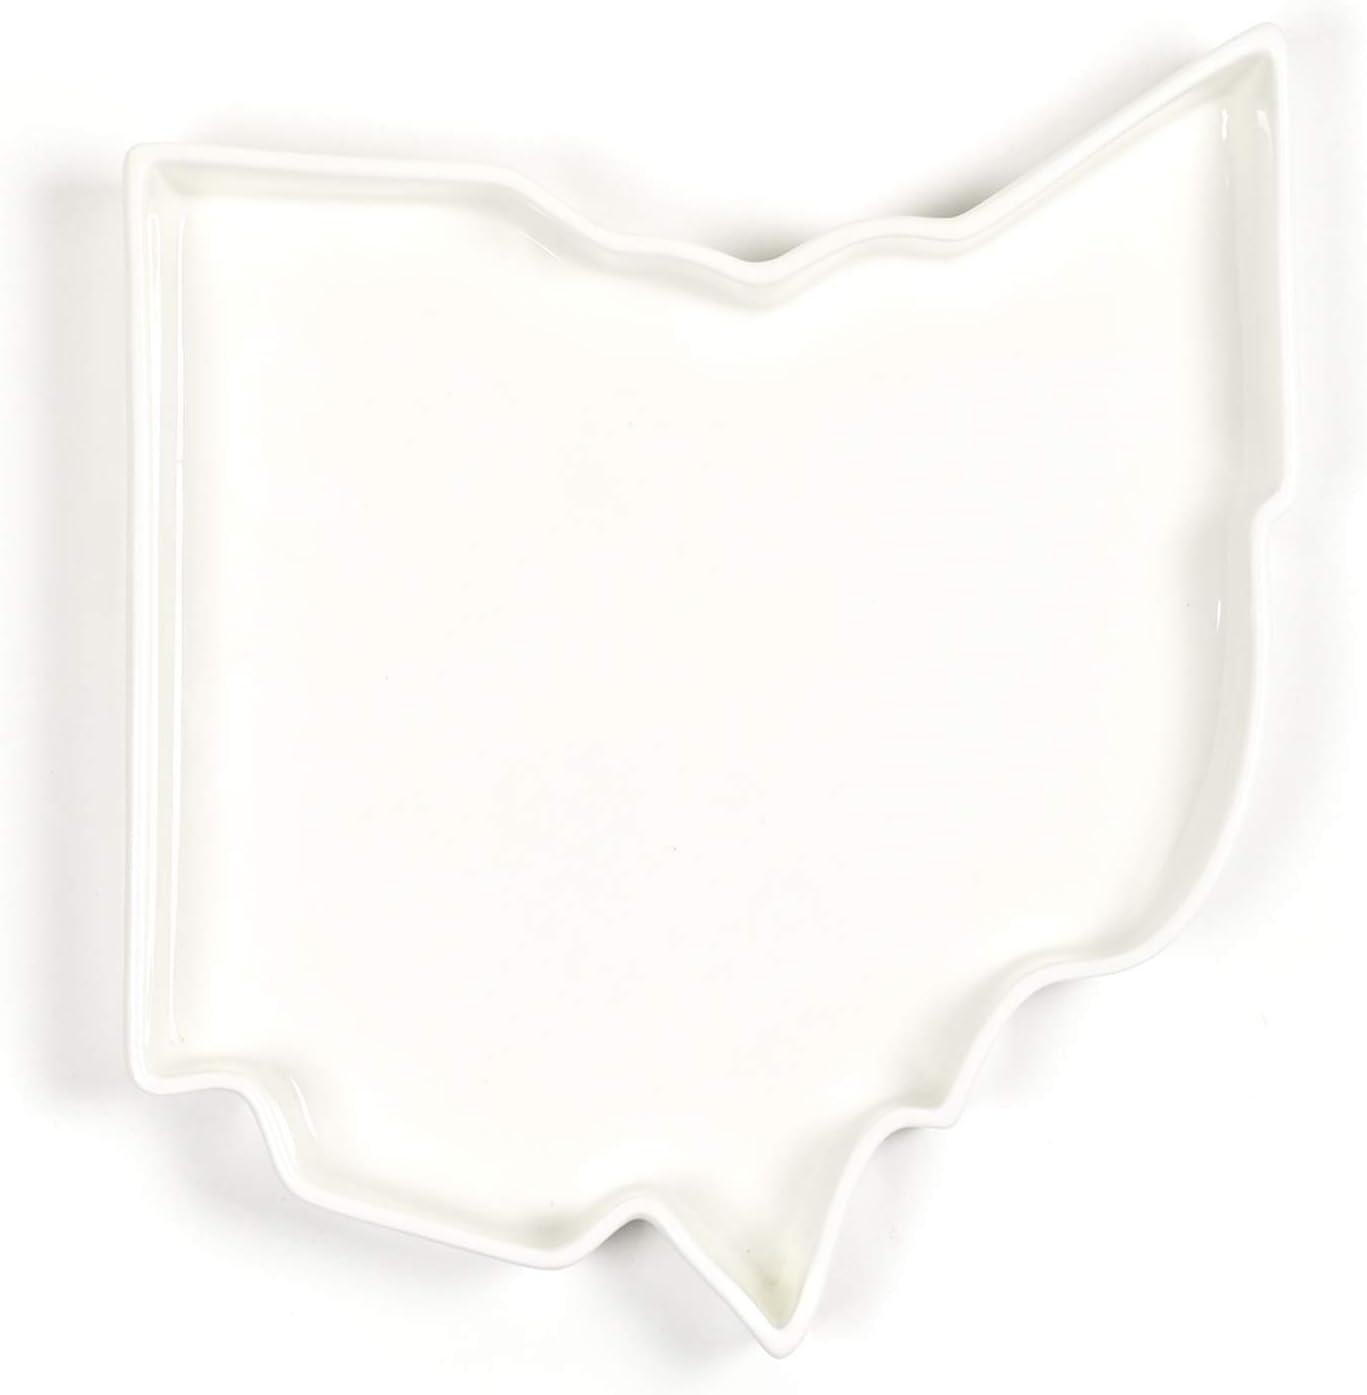 Ohio State Plate